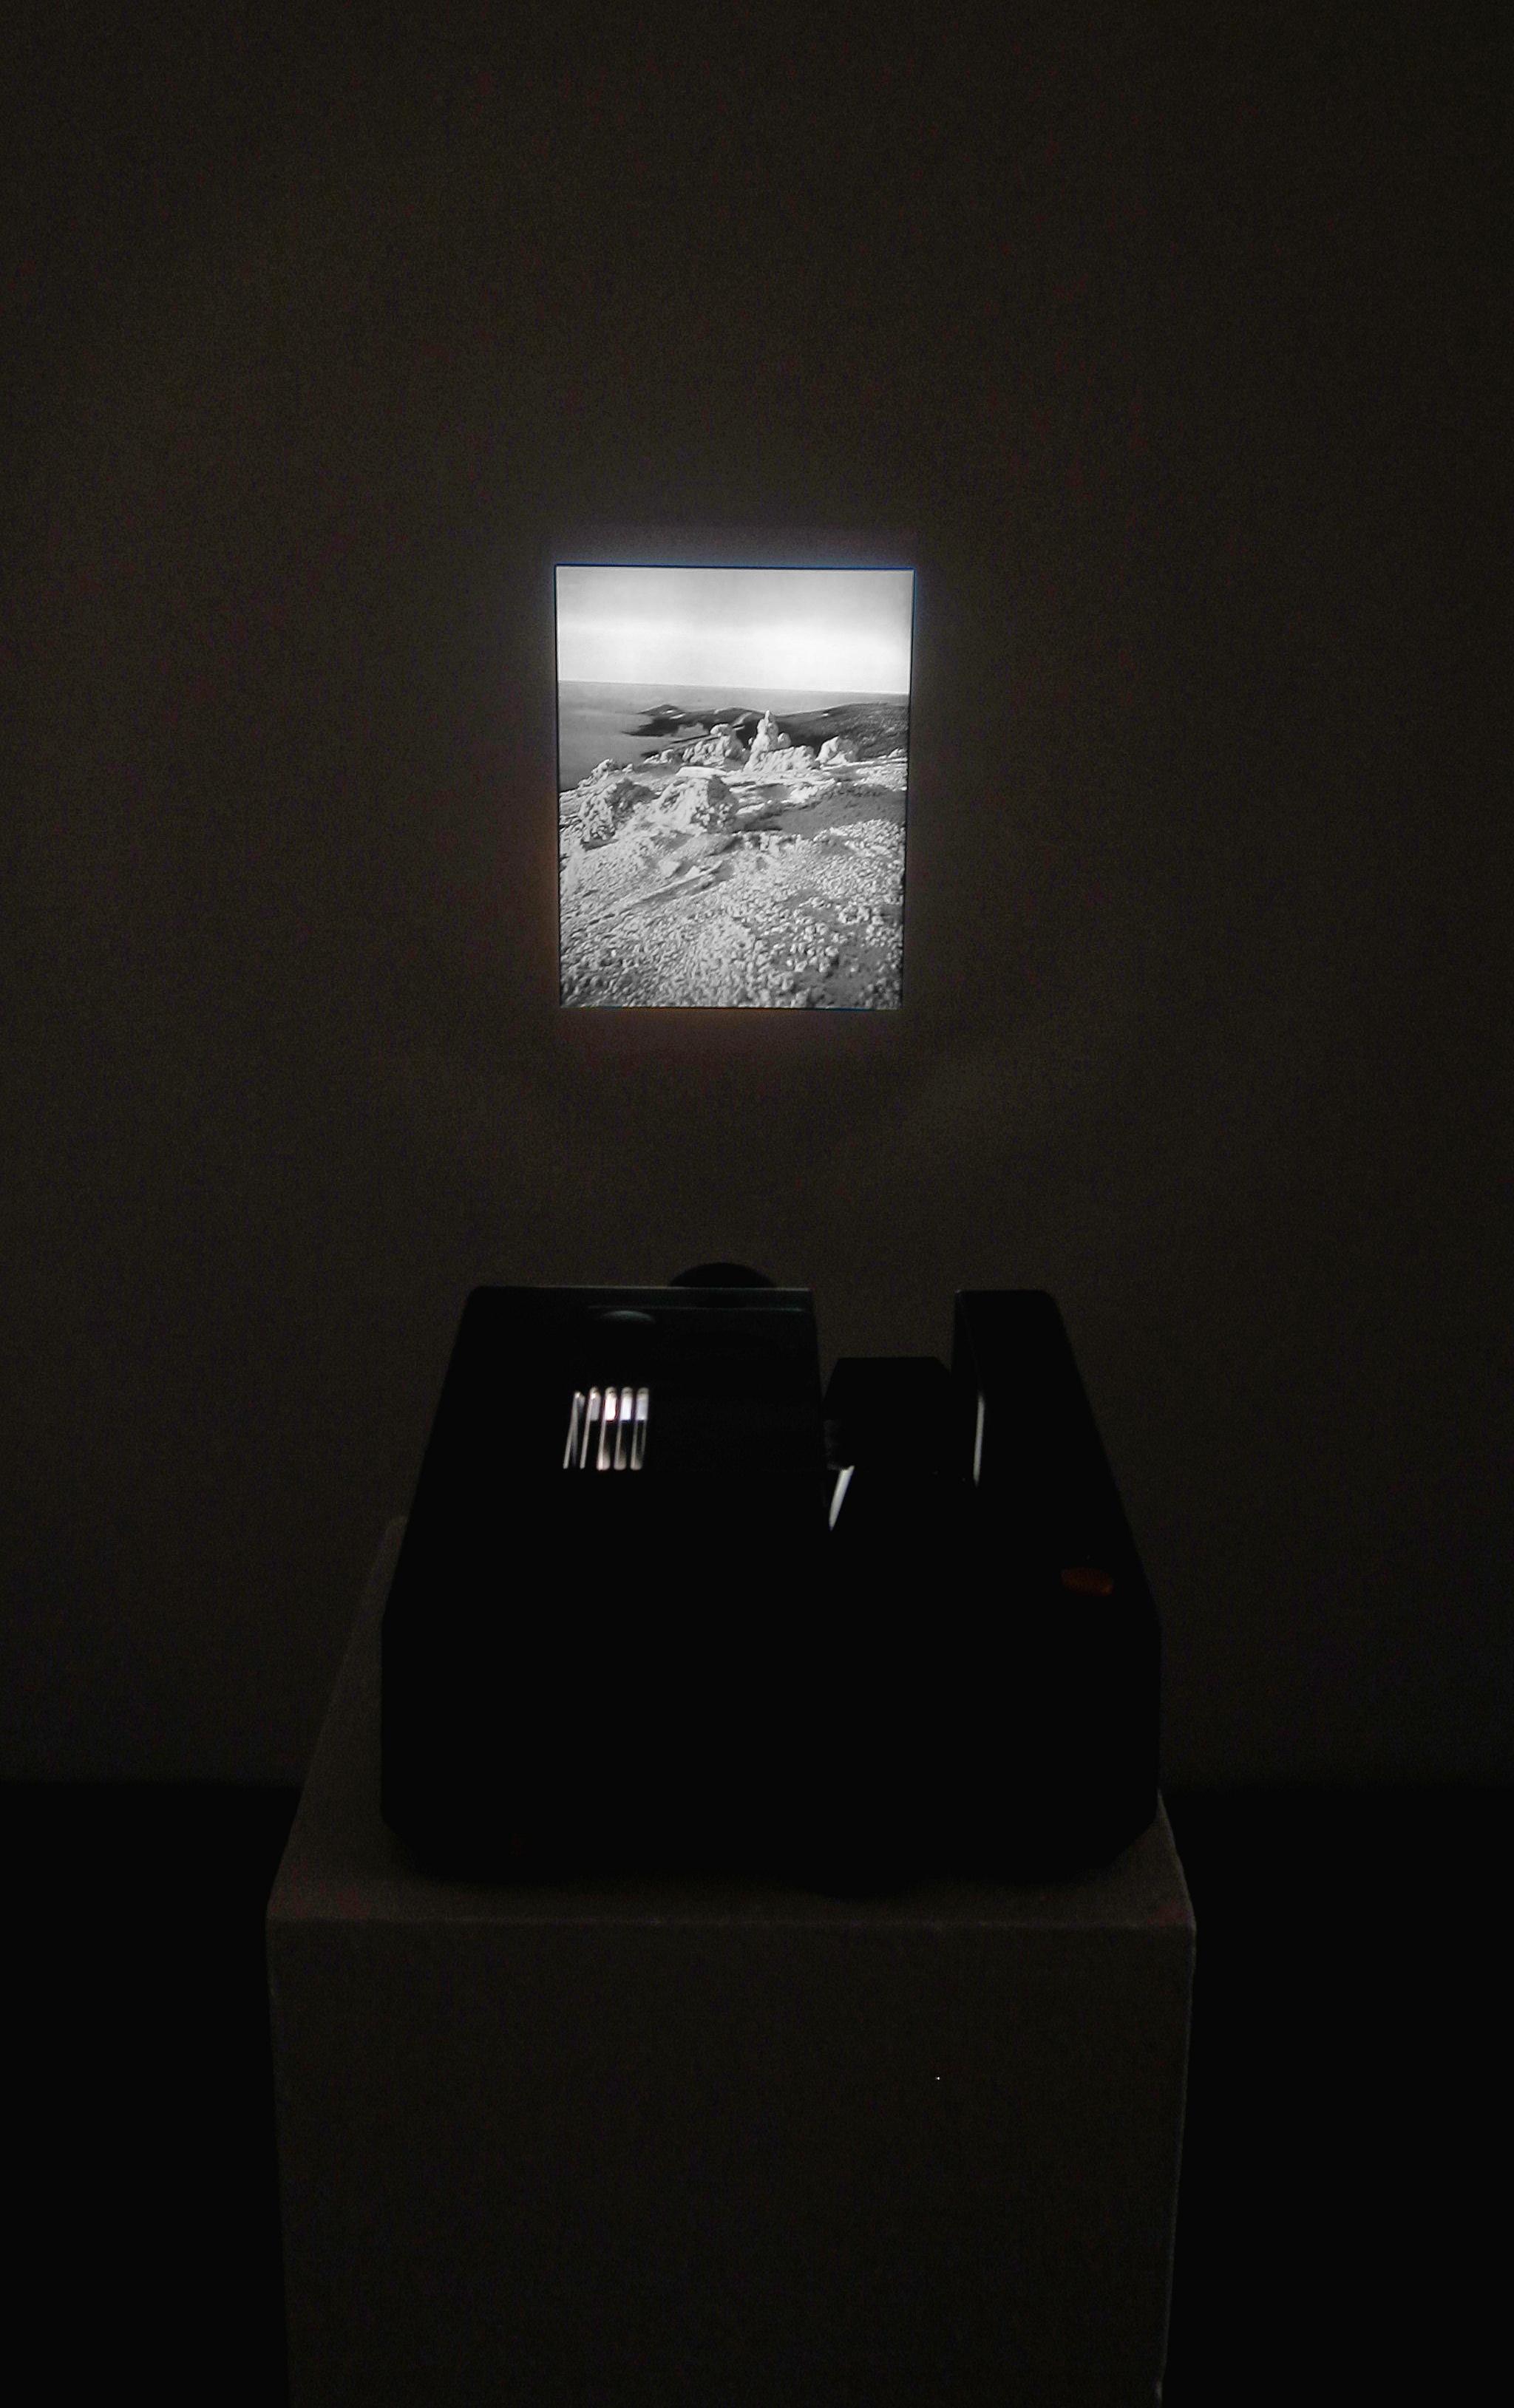 The Blind Image (Siberia)B&w.jpg